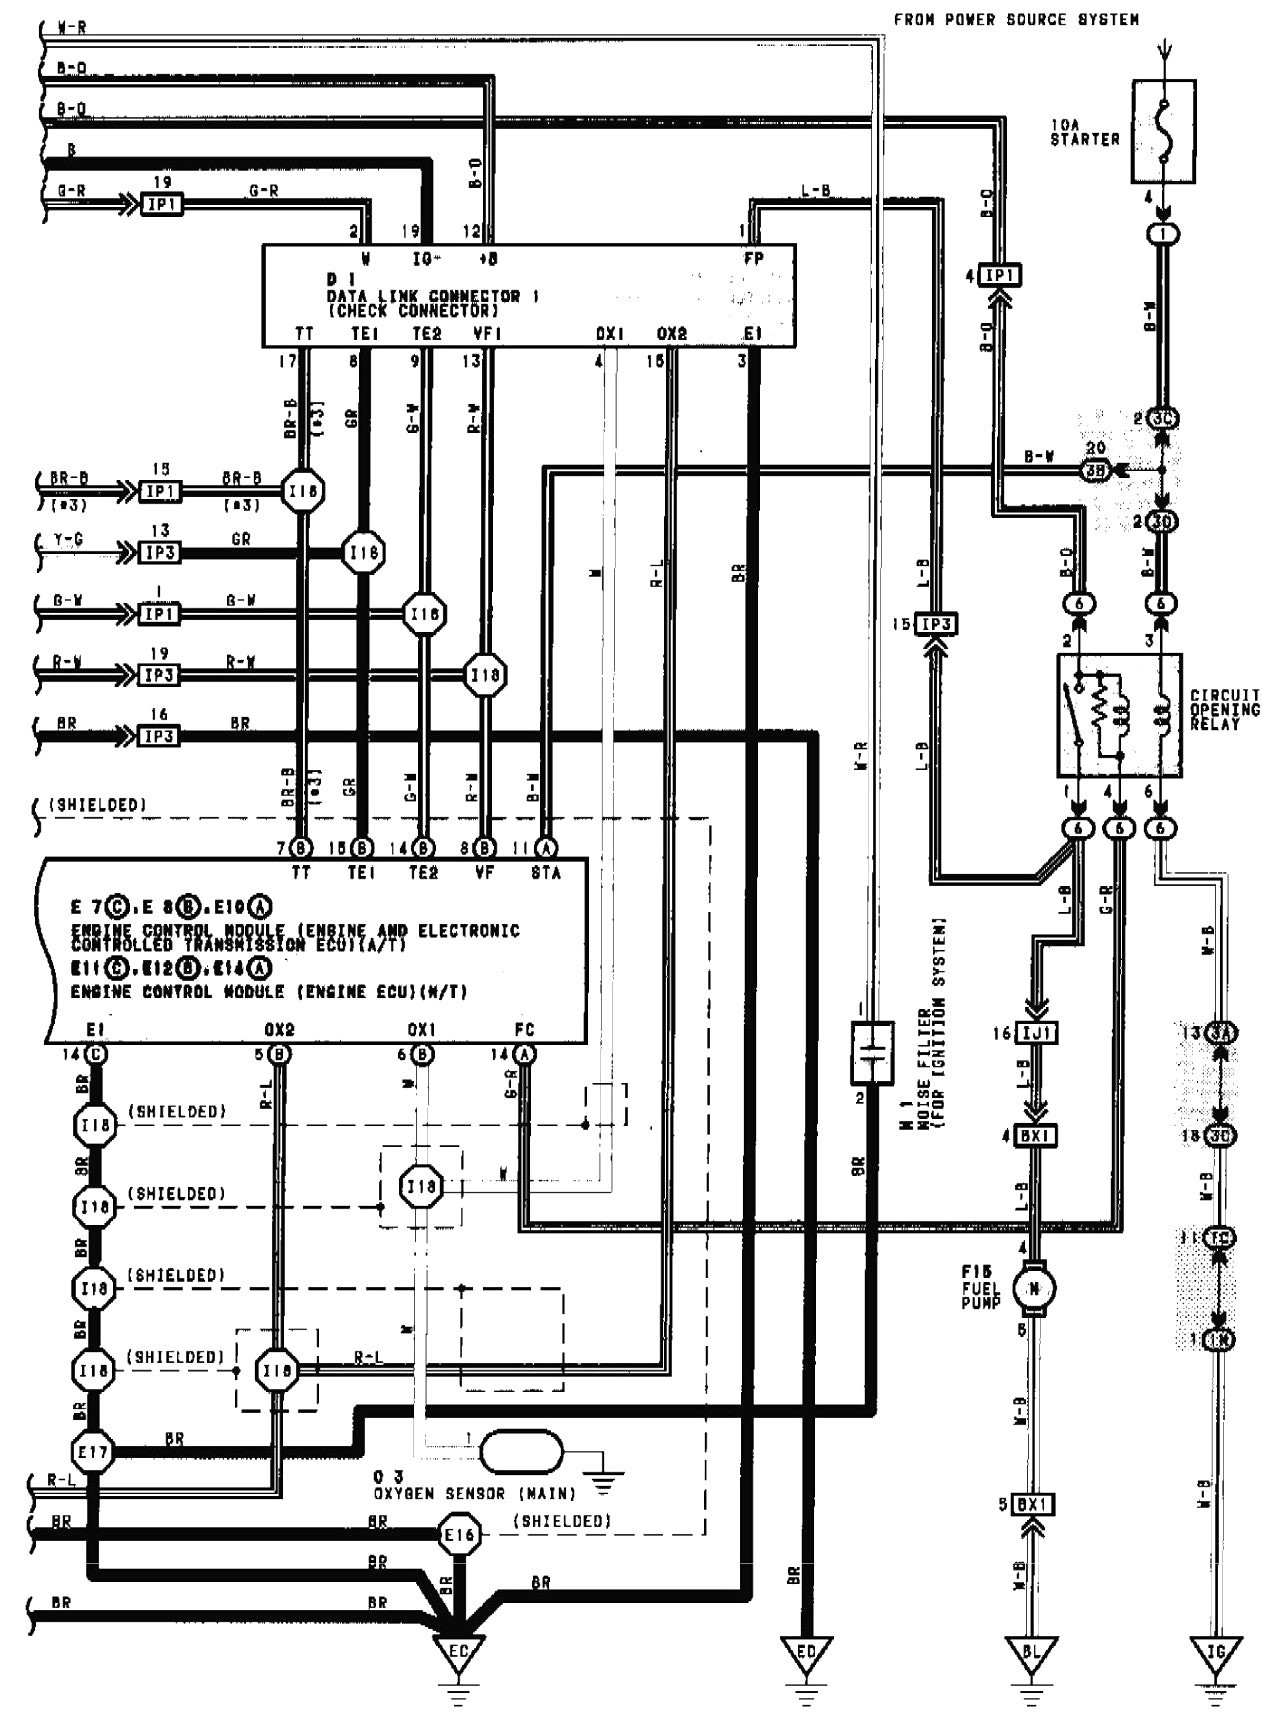 1990 camry radio wiring